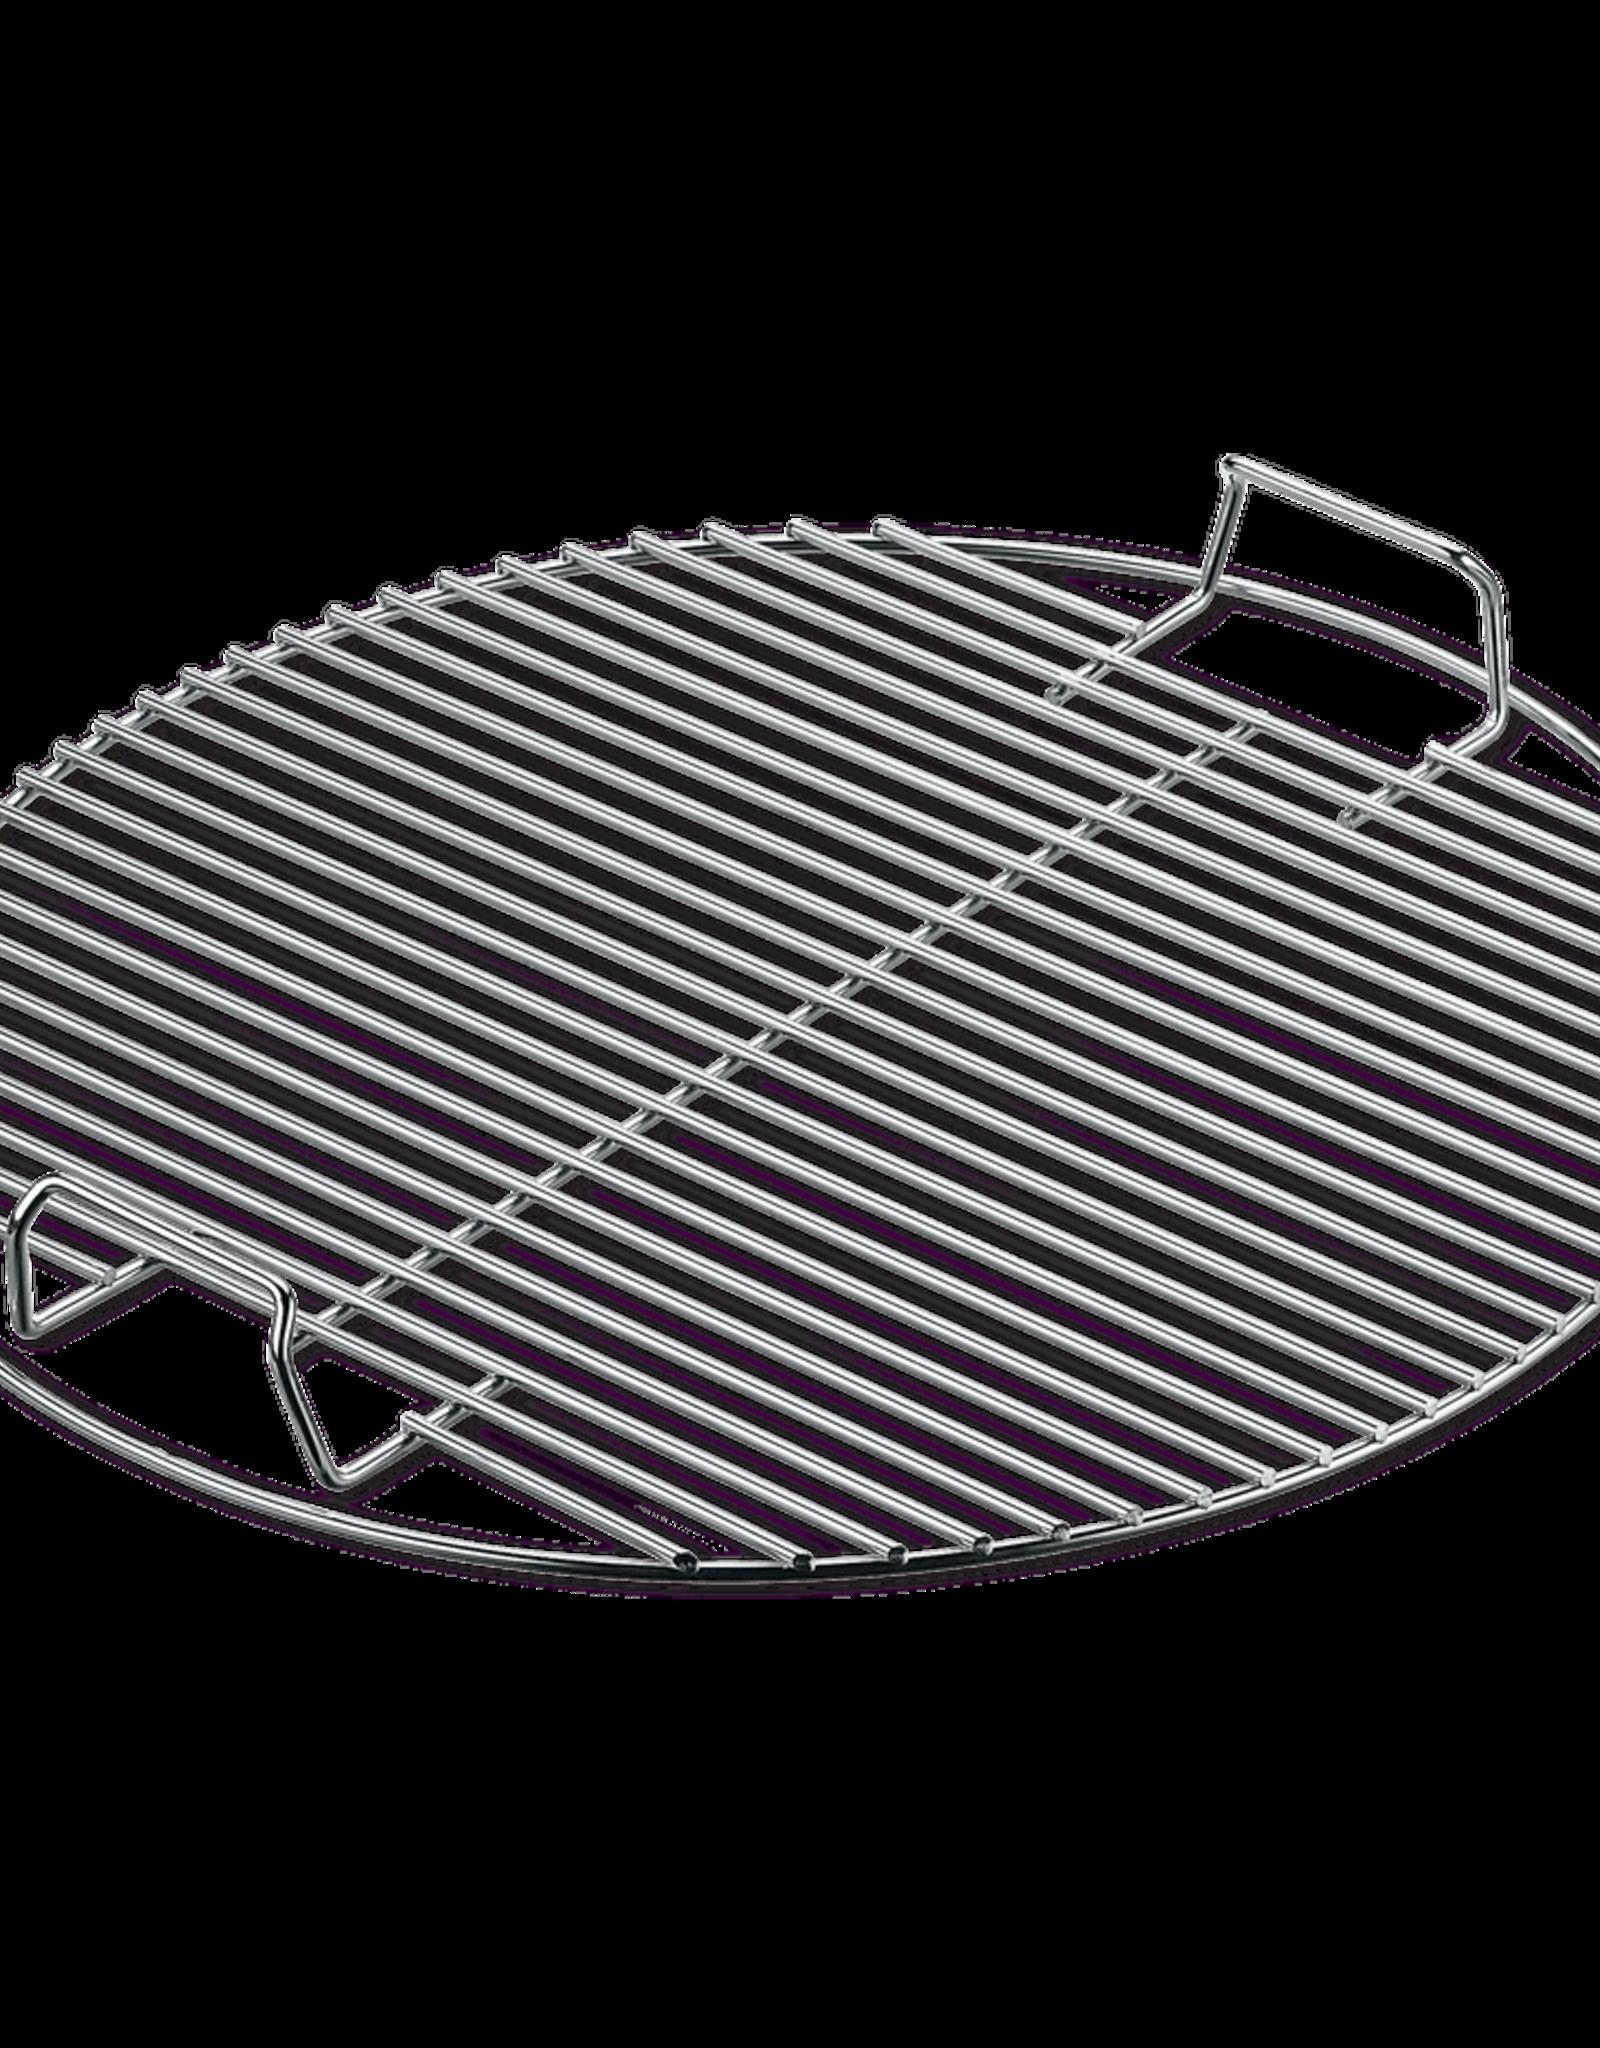 Weber Cooking Grate - Fits 18'' (not Smokey Mountain Cooker Smoker)